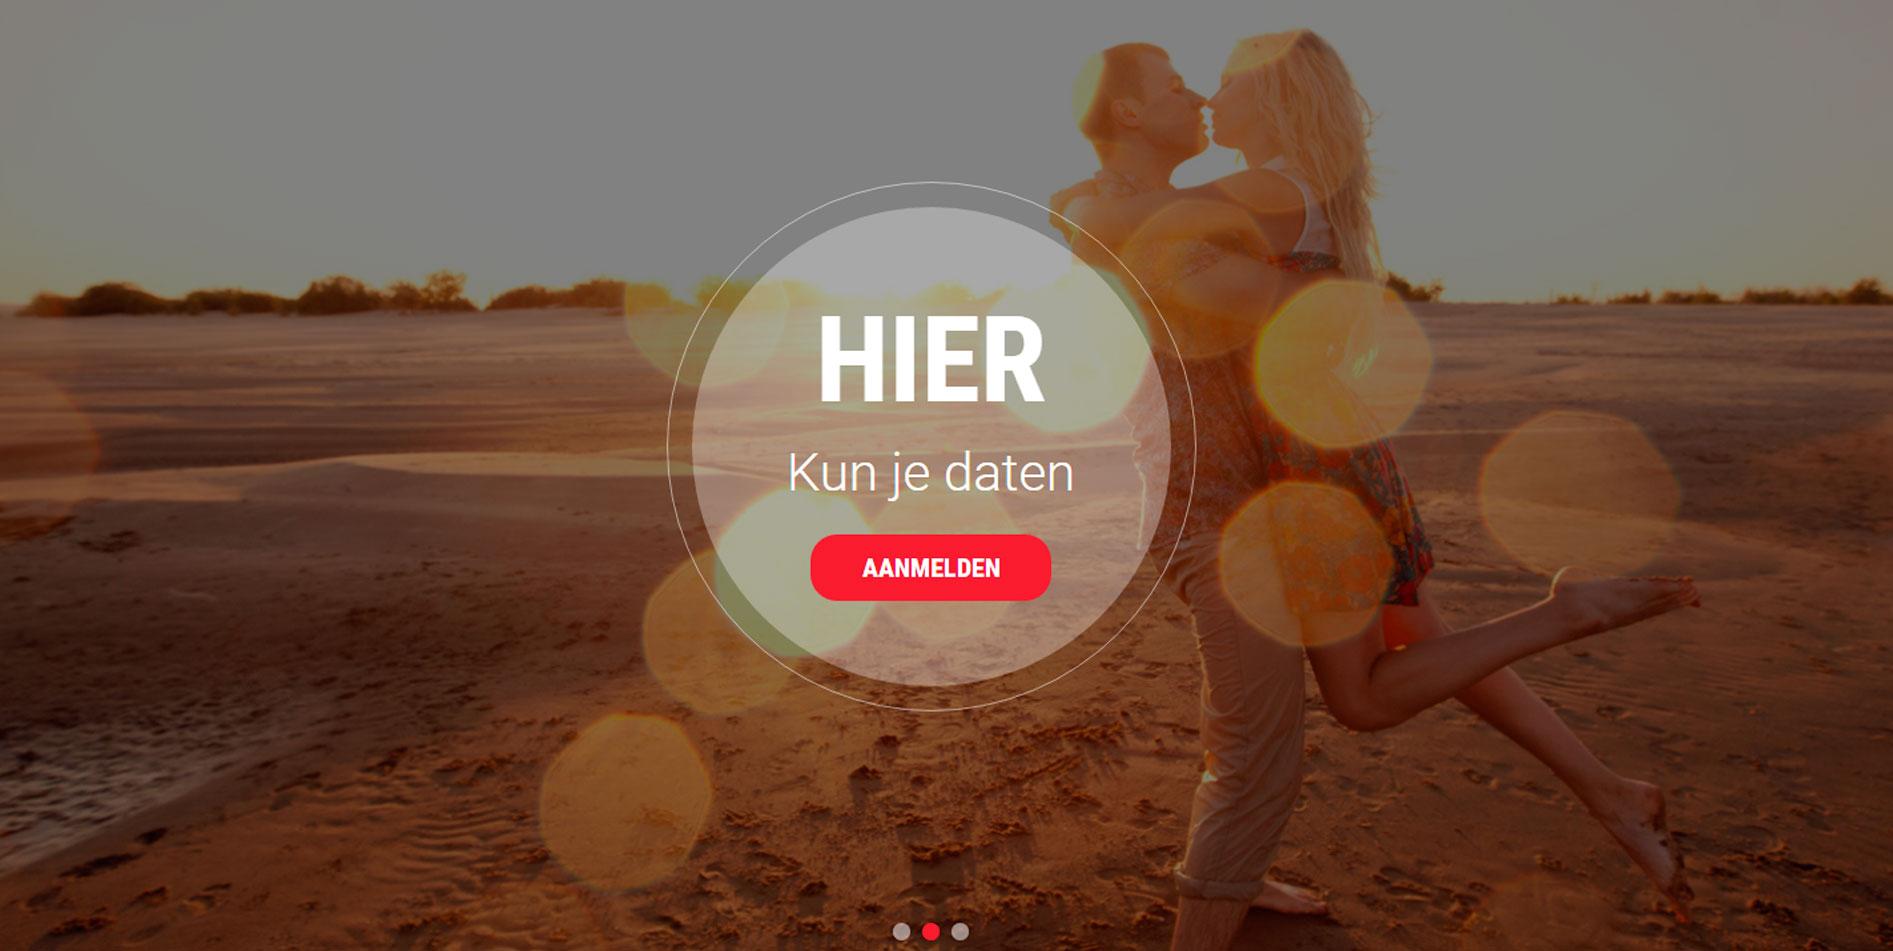 blendr dating site aanmelden